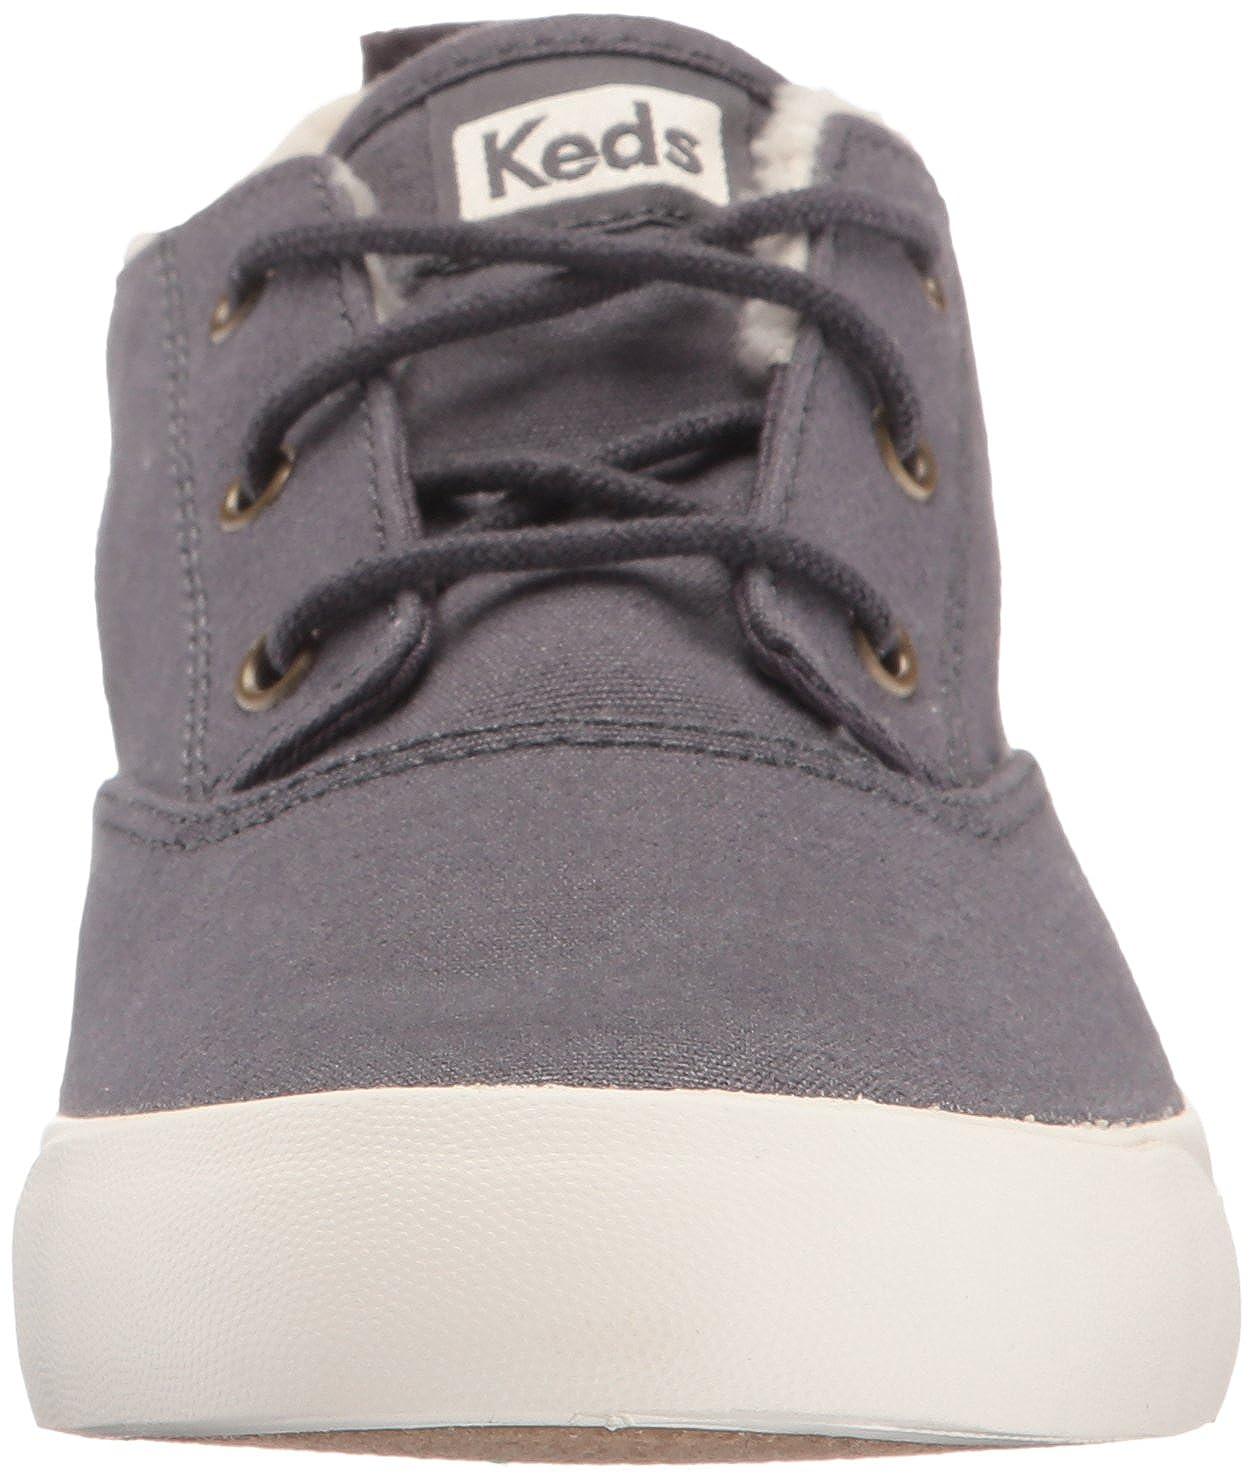 Keds Womens Triumph Mid Canvas Faux Shearling Fashion Sneaker